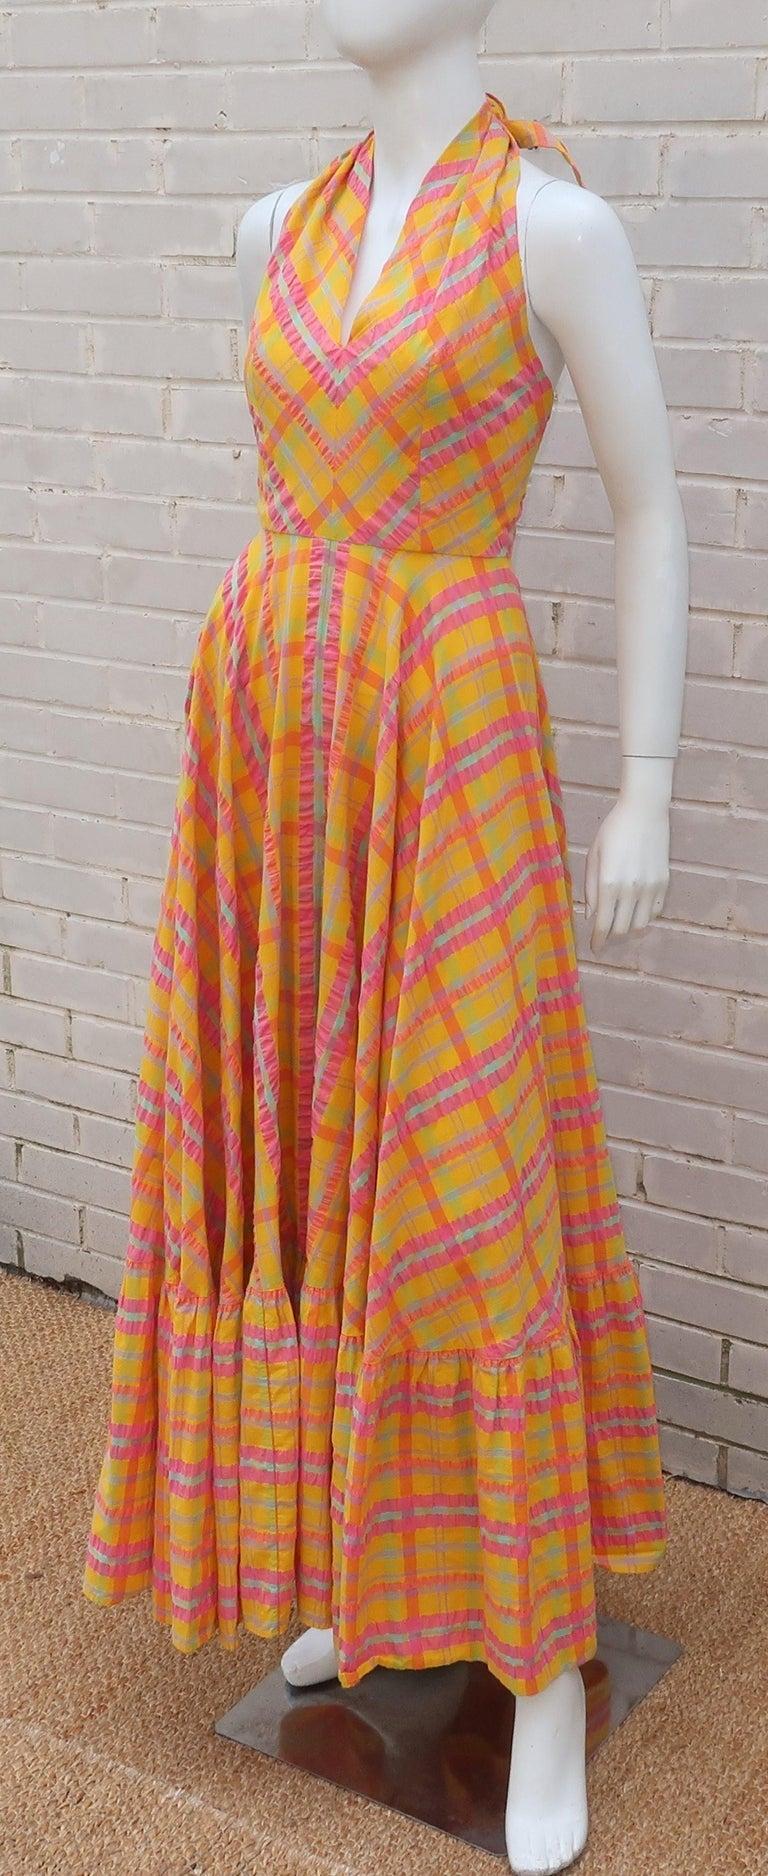 Christian Dior Seersucker Plaid Cotton Halter Peasant Dress, 1960s  For Sale 3